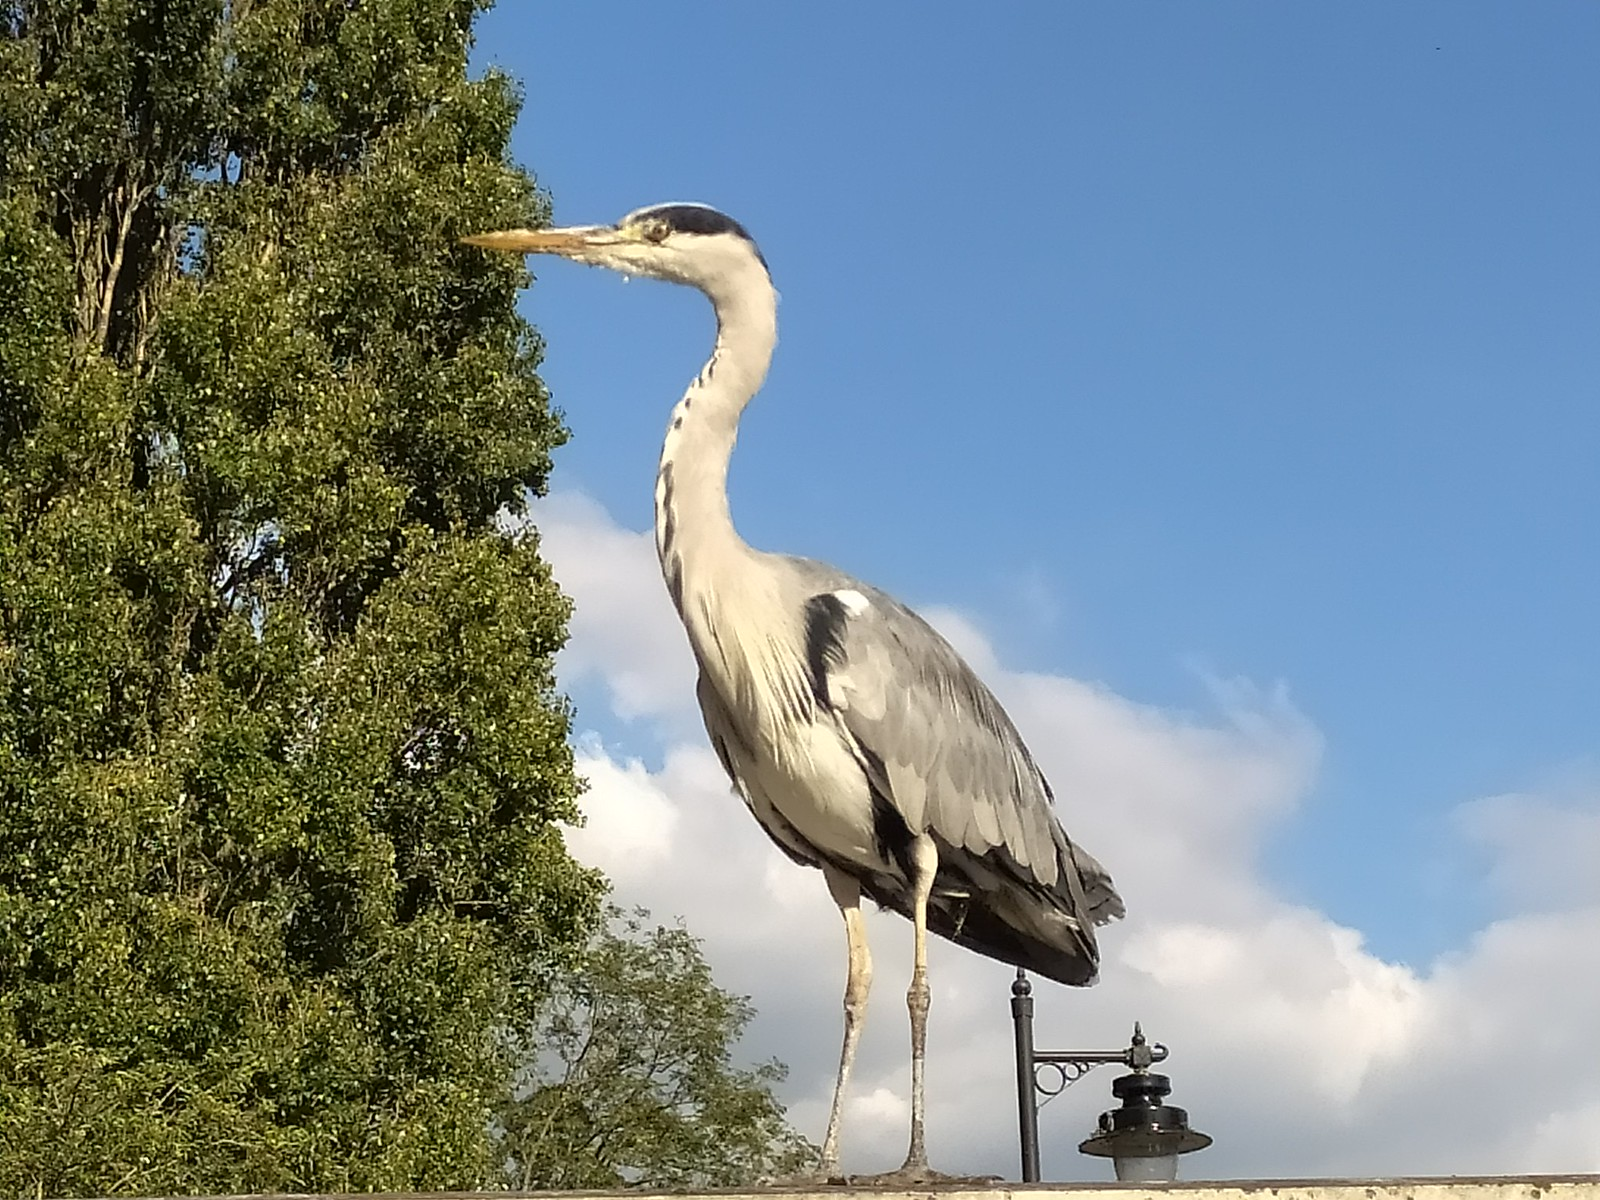 Tame heron by Carshalton Pond